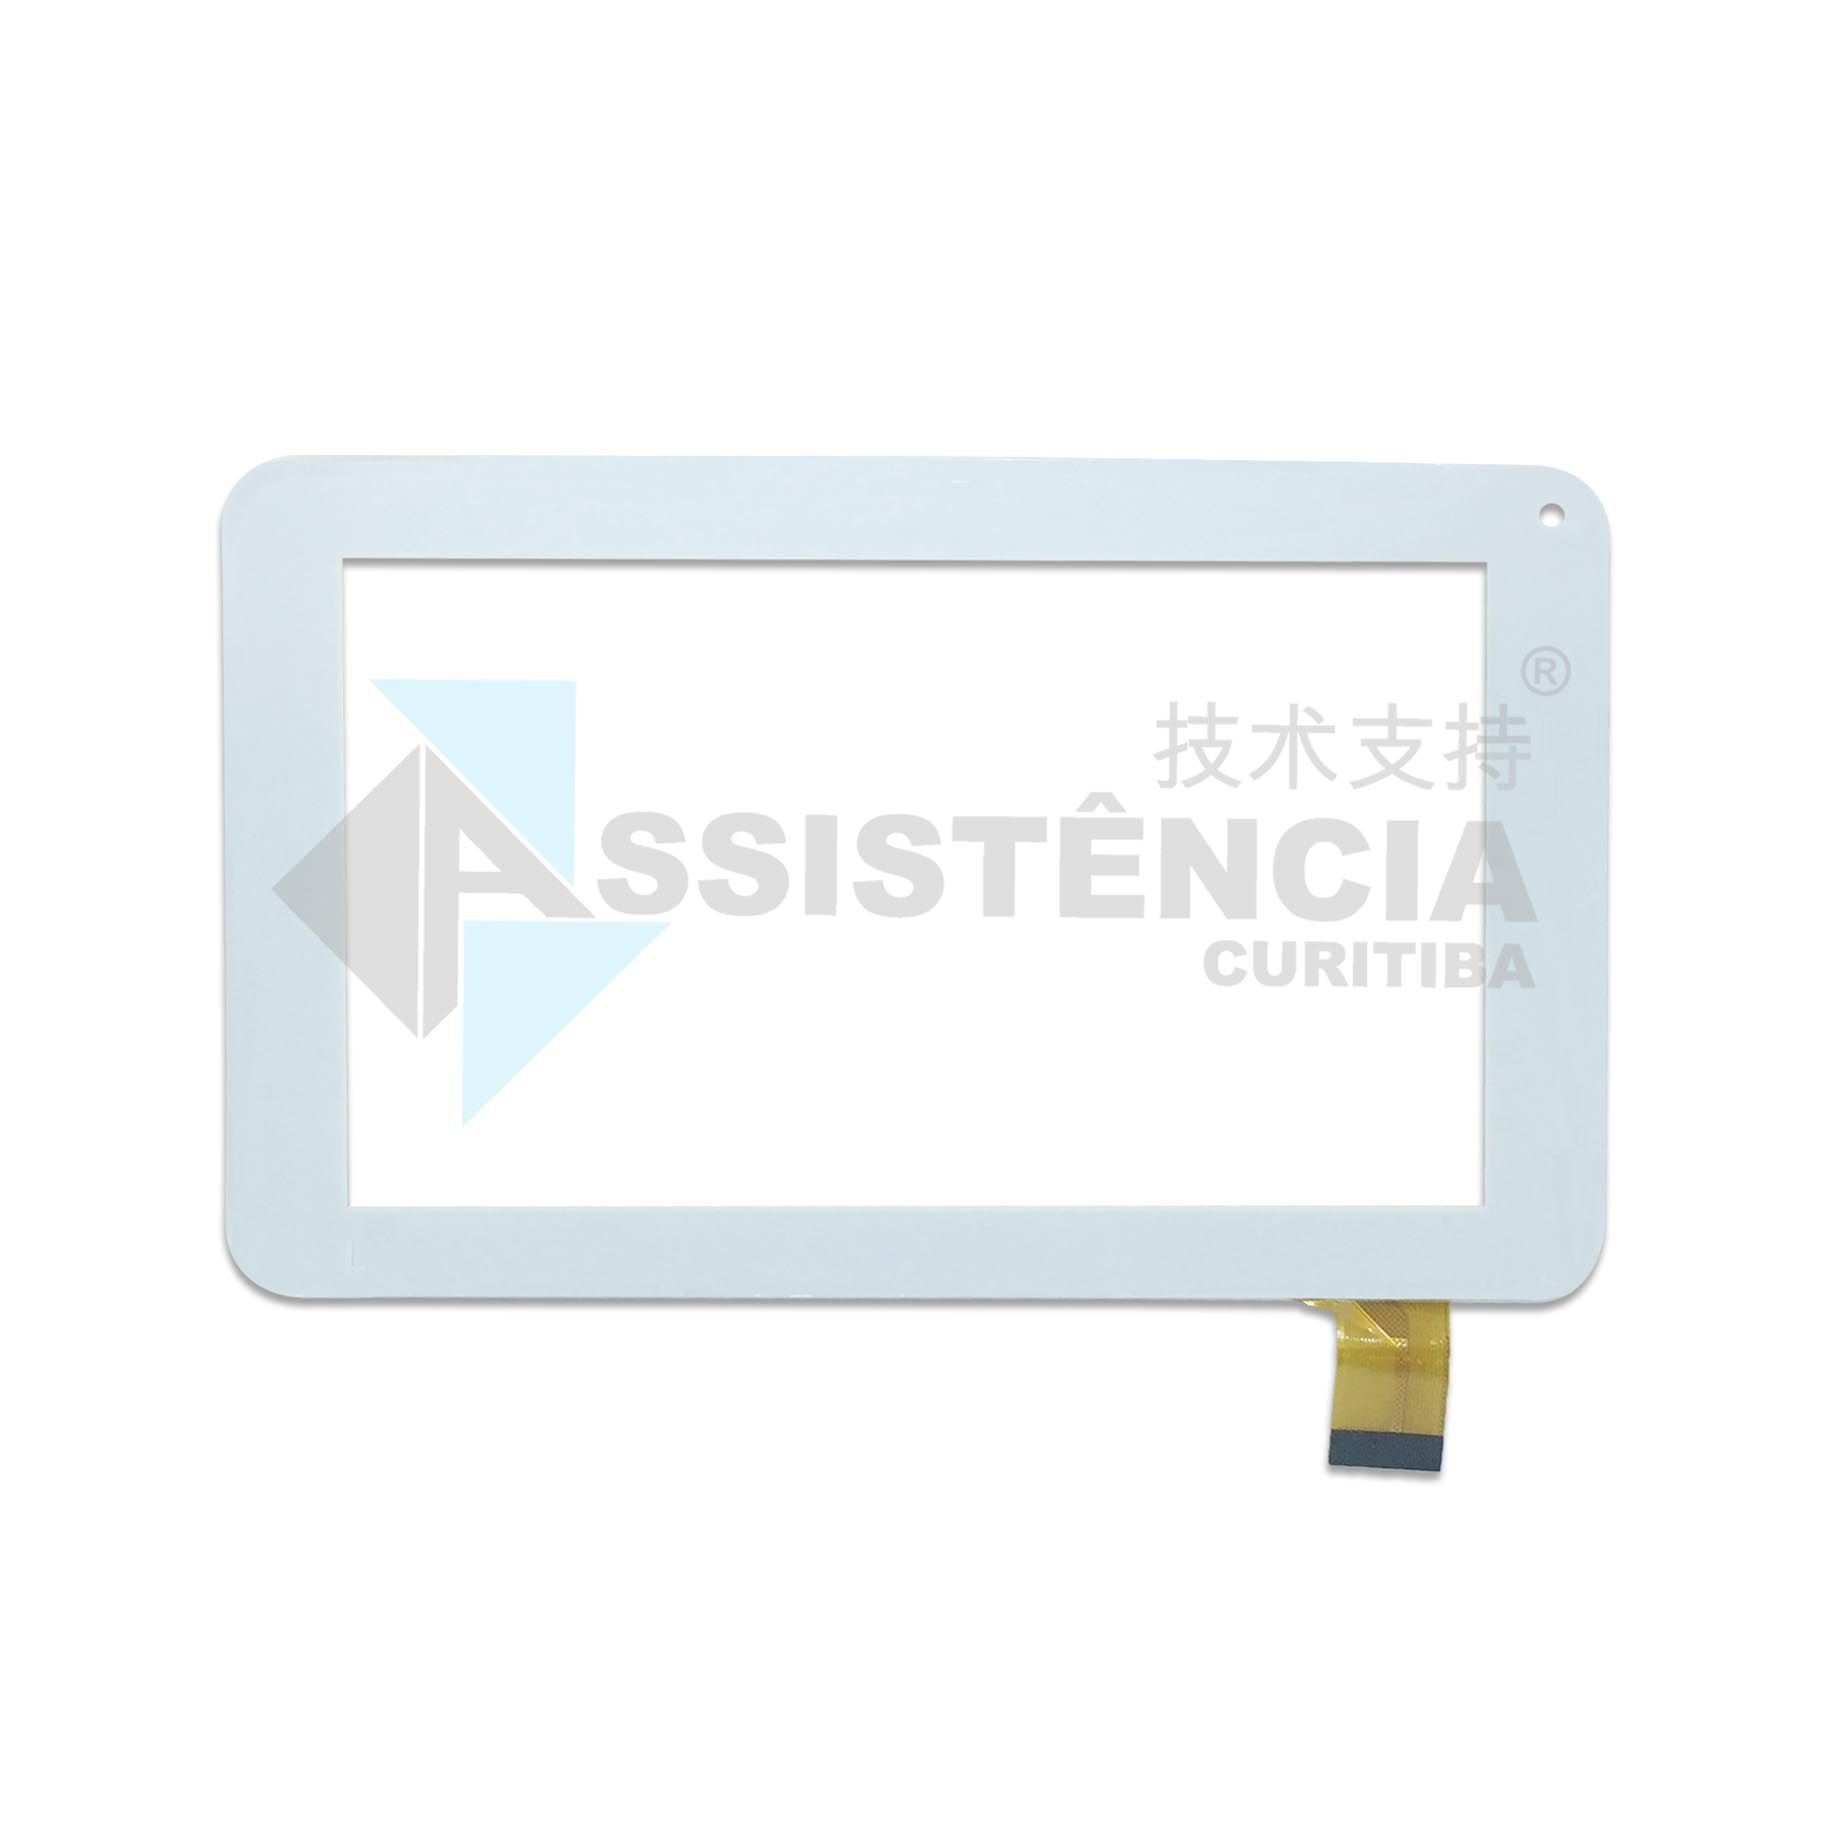 Tela Touch Dl I -Style Pis T71 Brat71 Branco